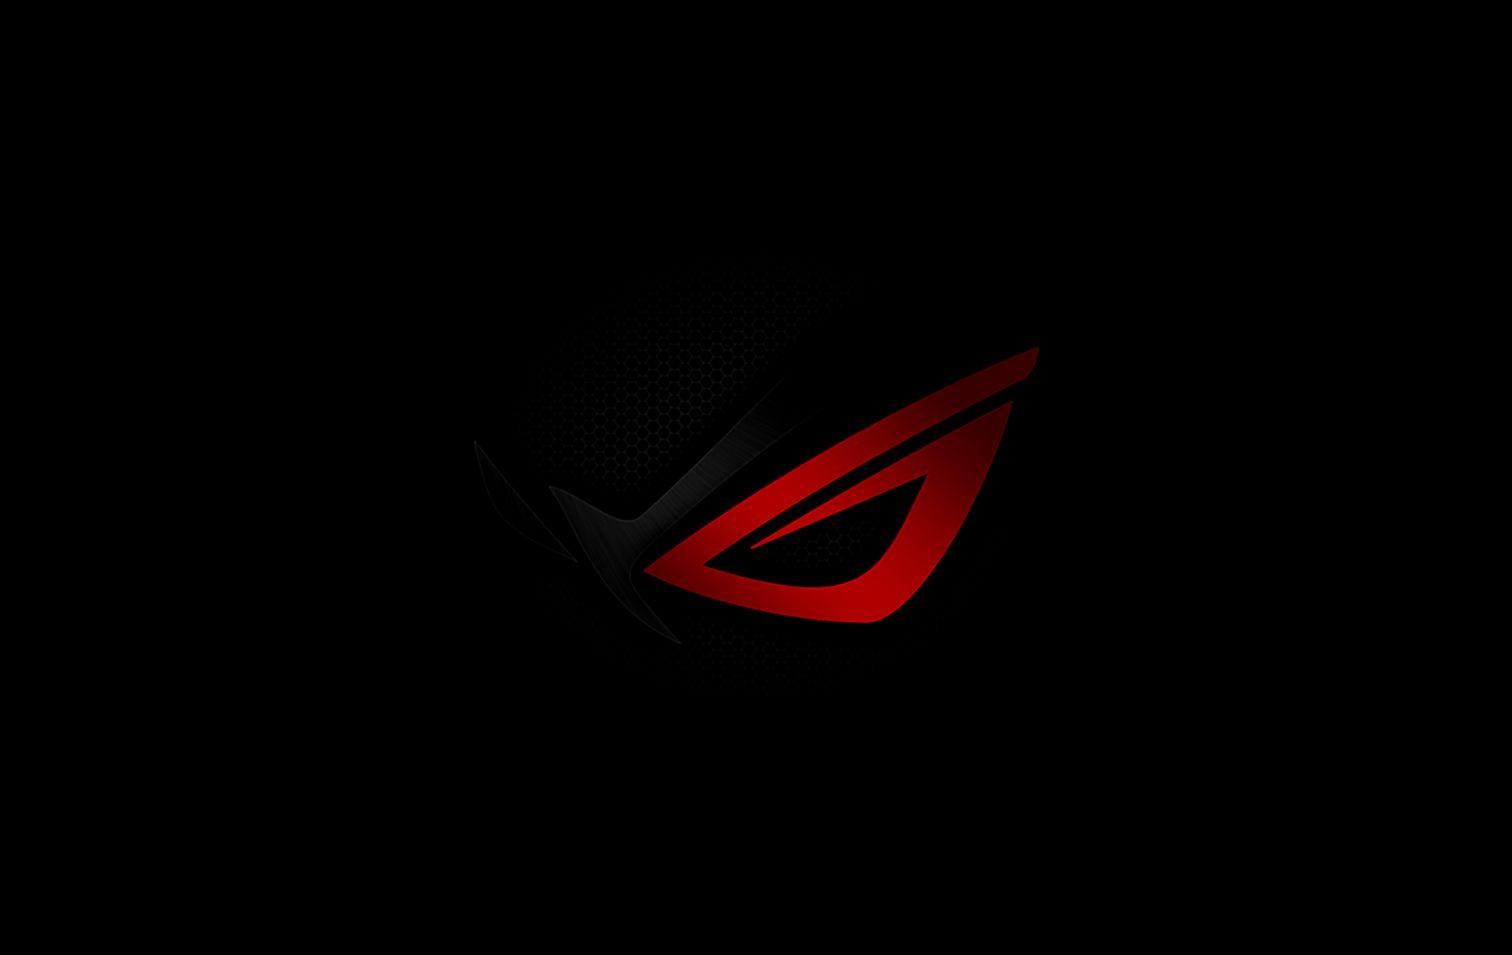 Asus Rog Logo Hd Wallpaper